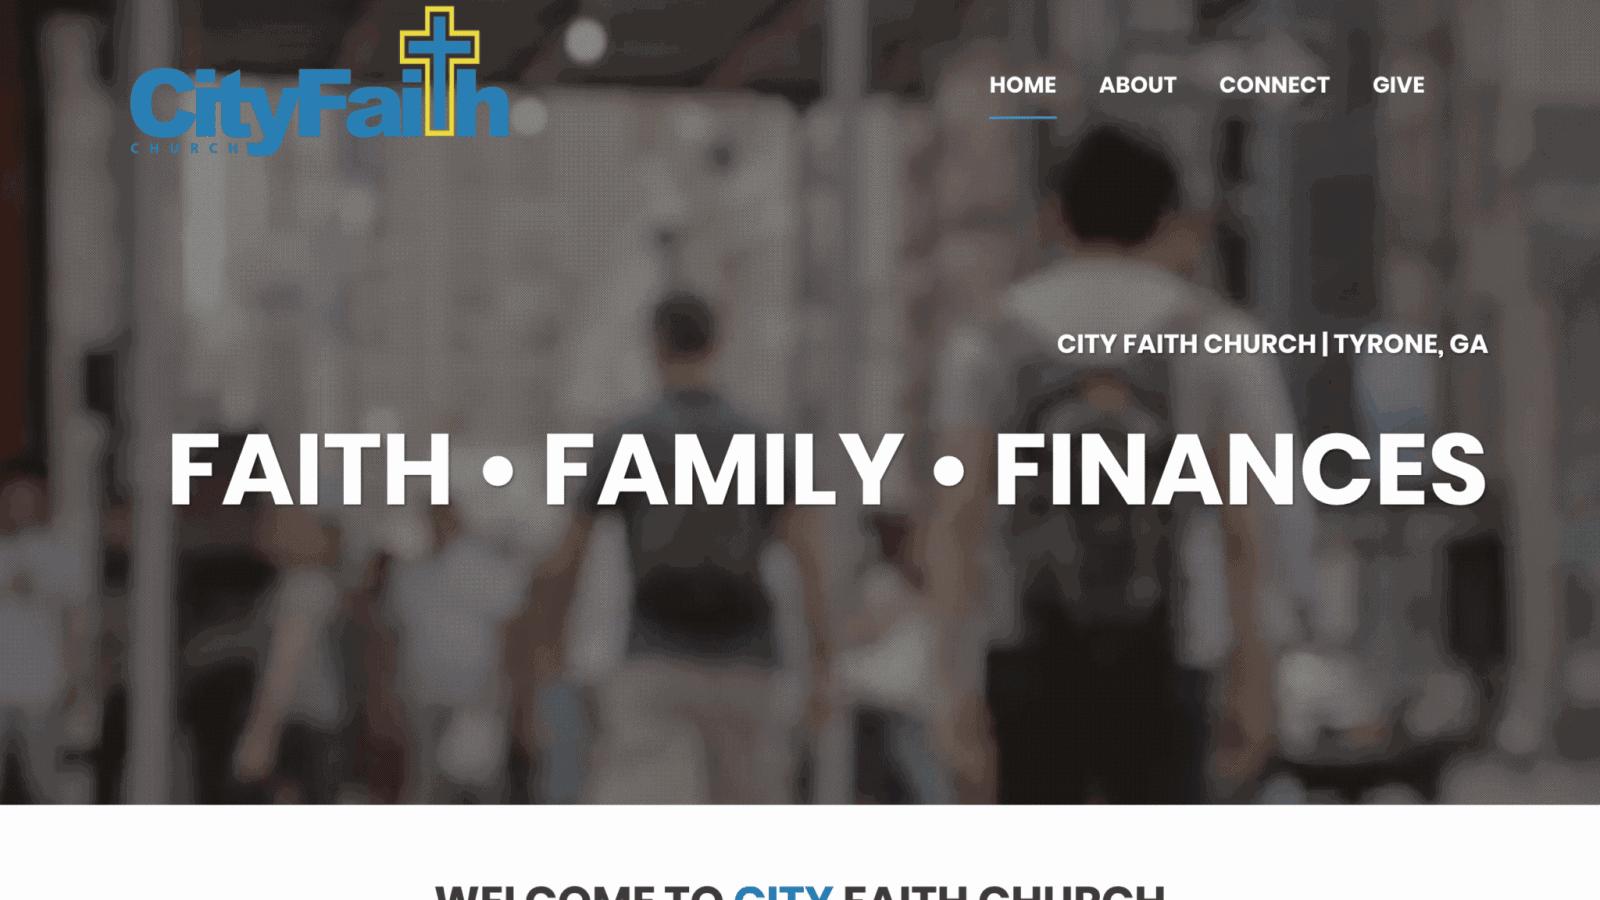 tulsa church website design